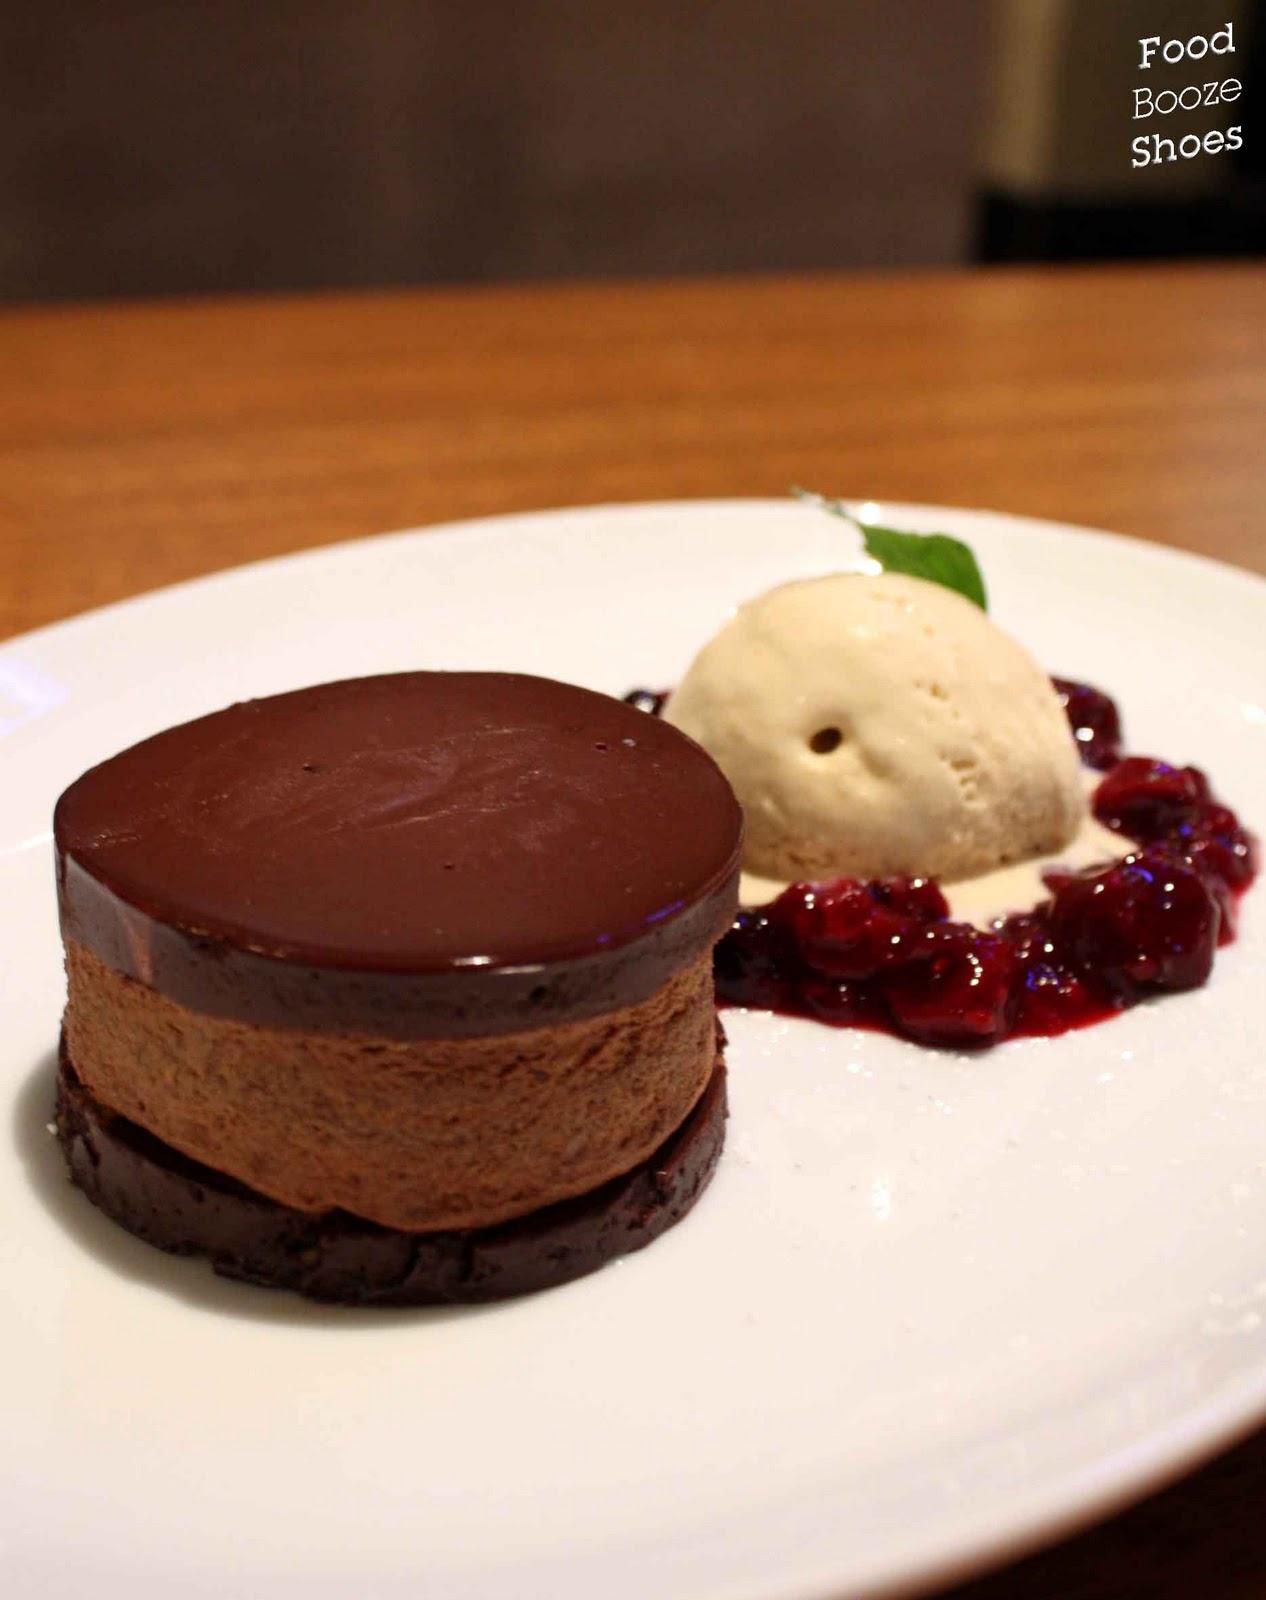 Chocolate Almond Ice Cream